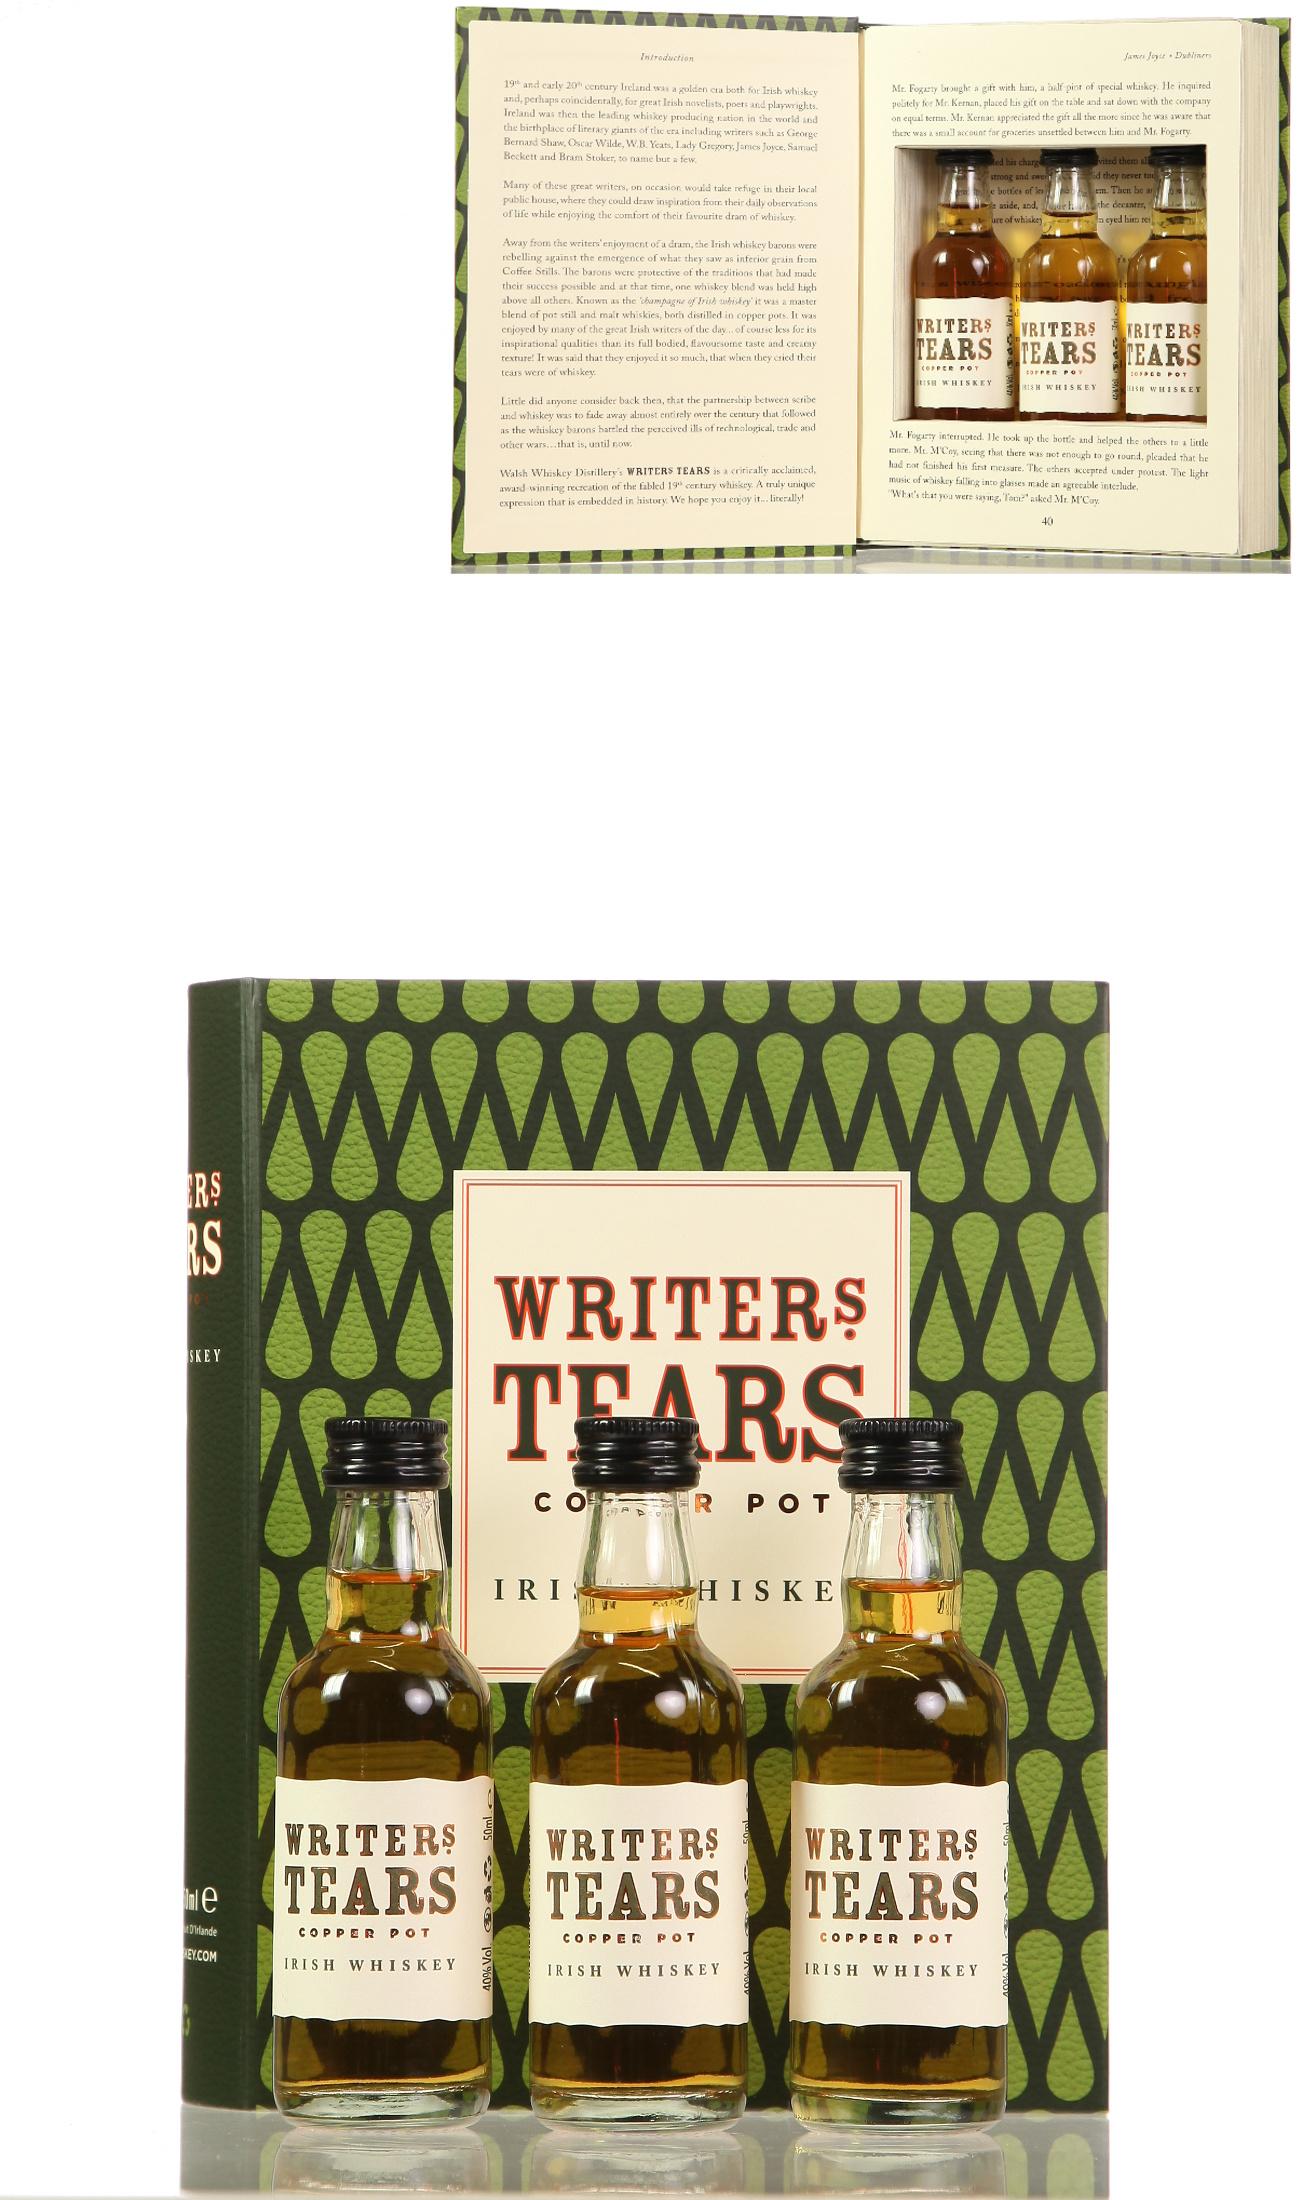 Miniatursortiment Writers Tears (Irland)